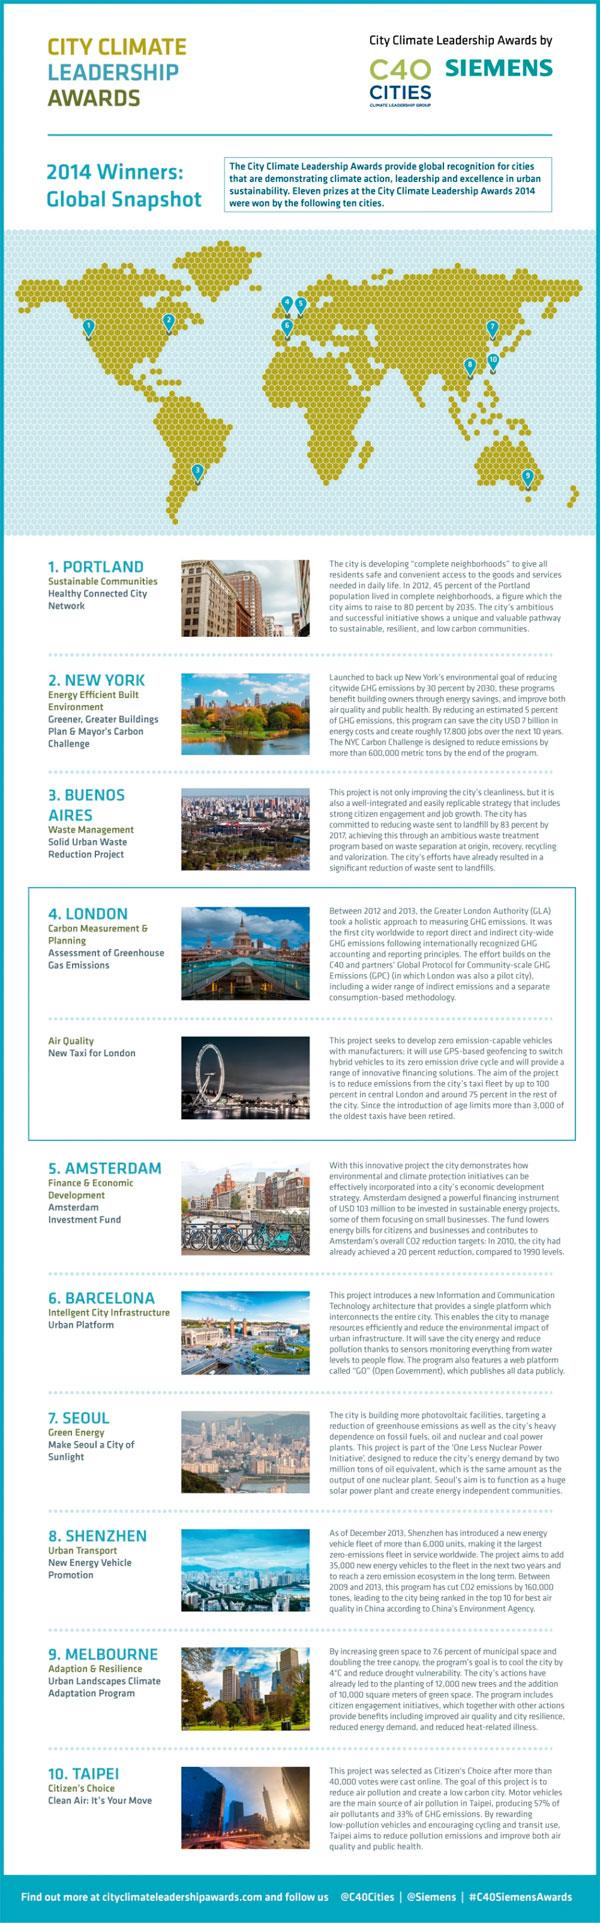 City Climate Leadership Award winners